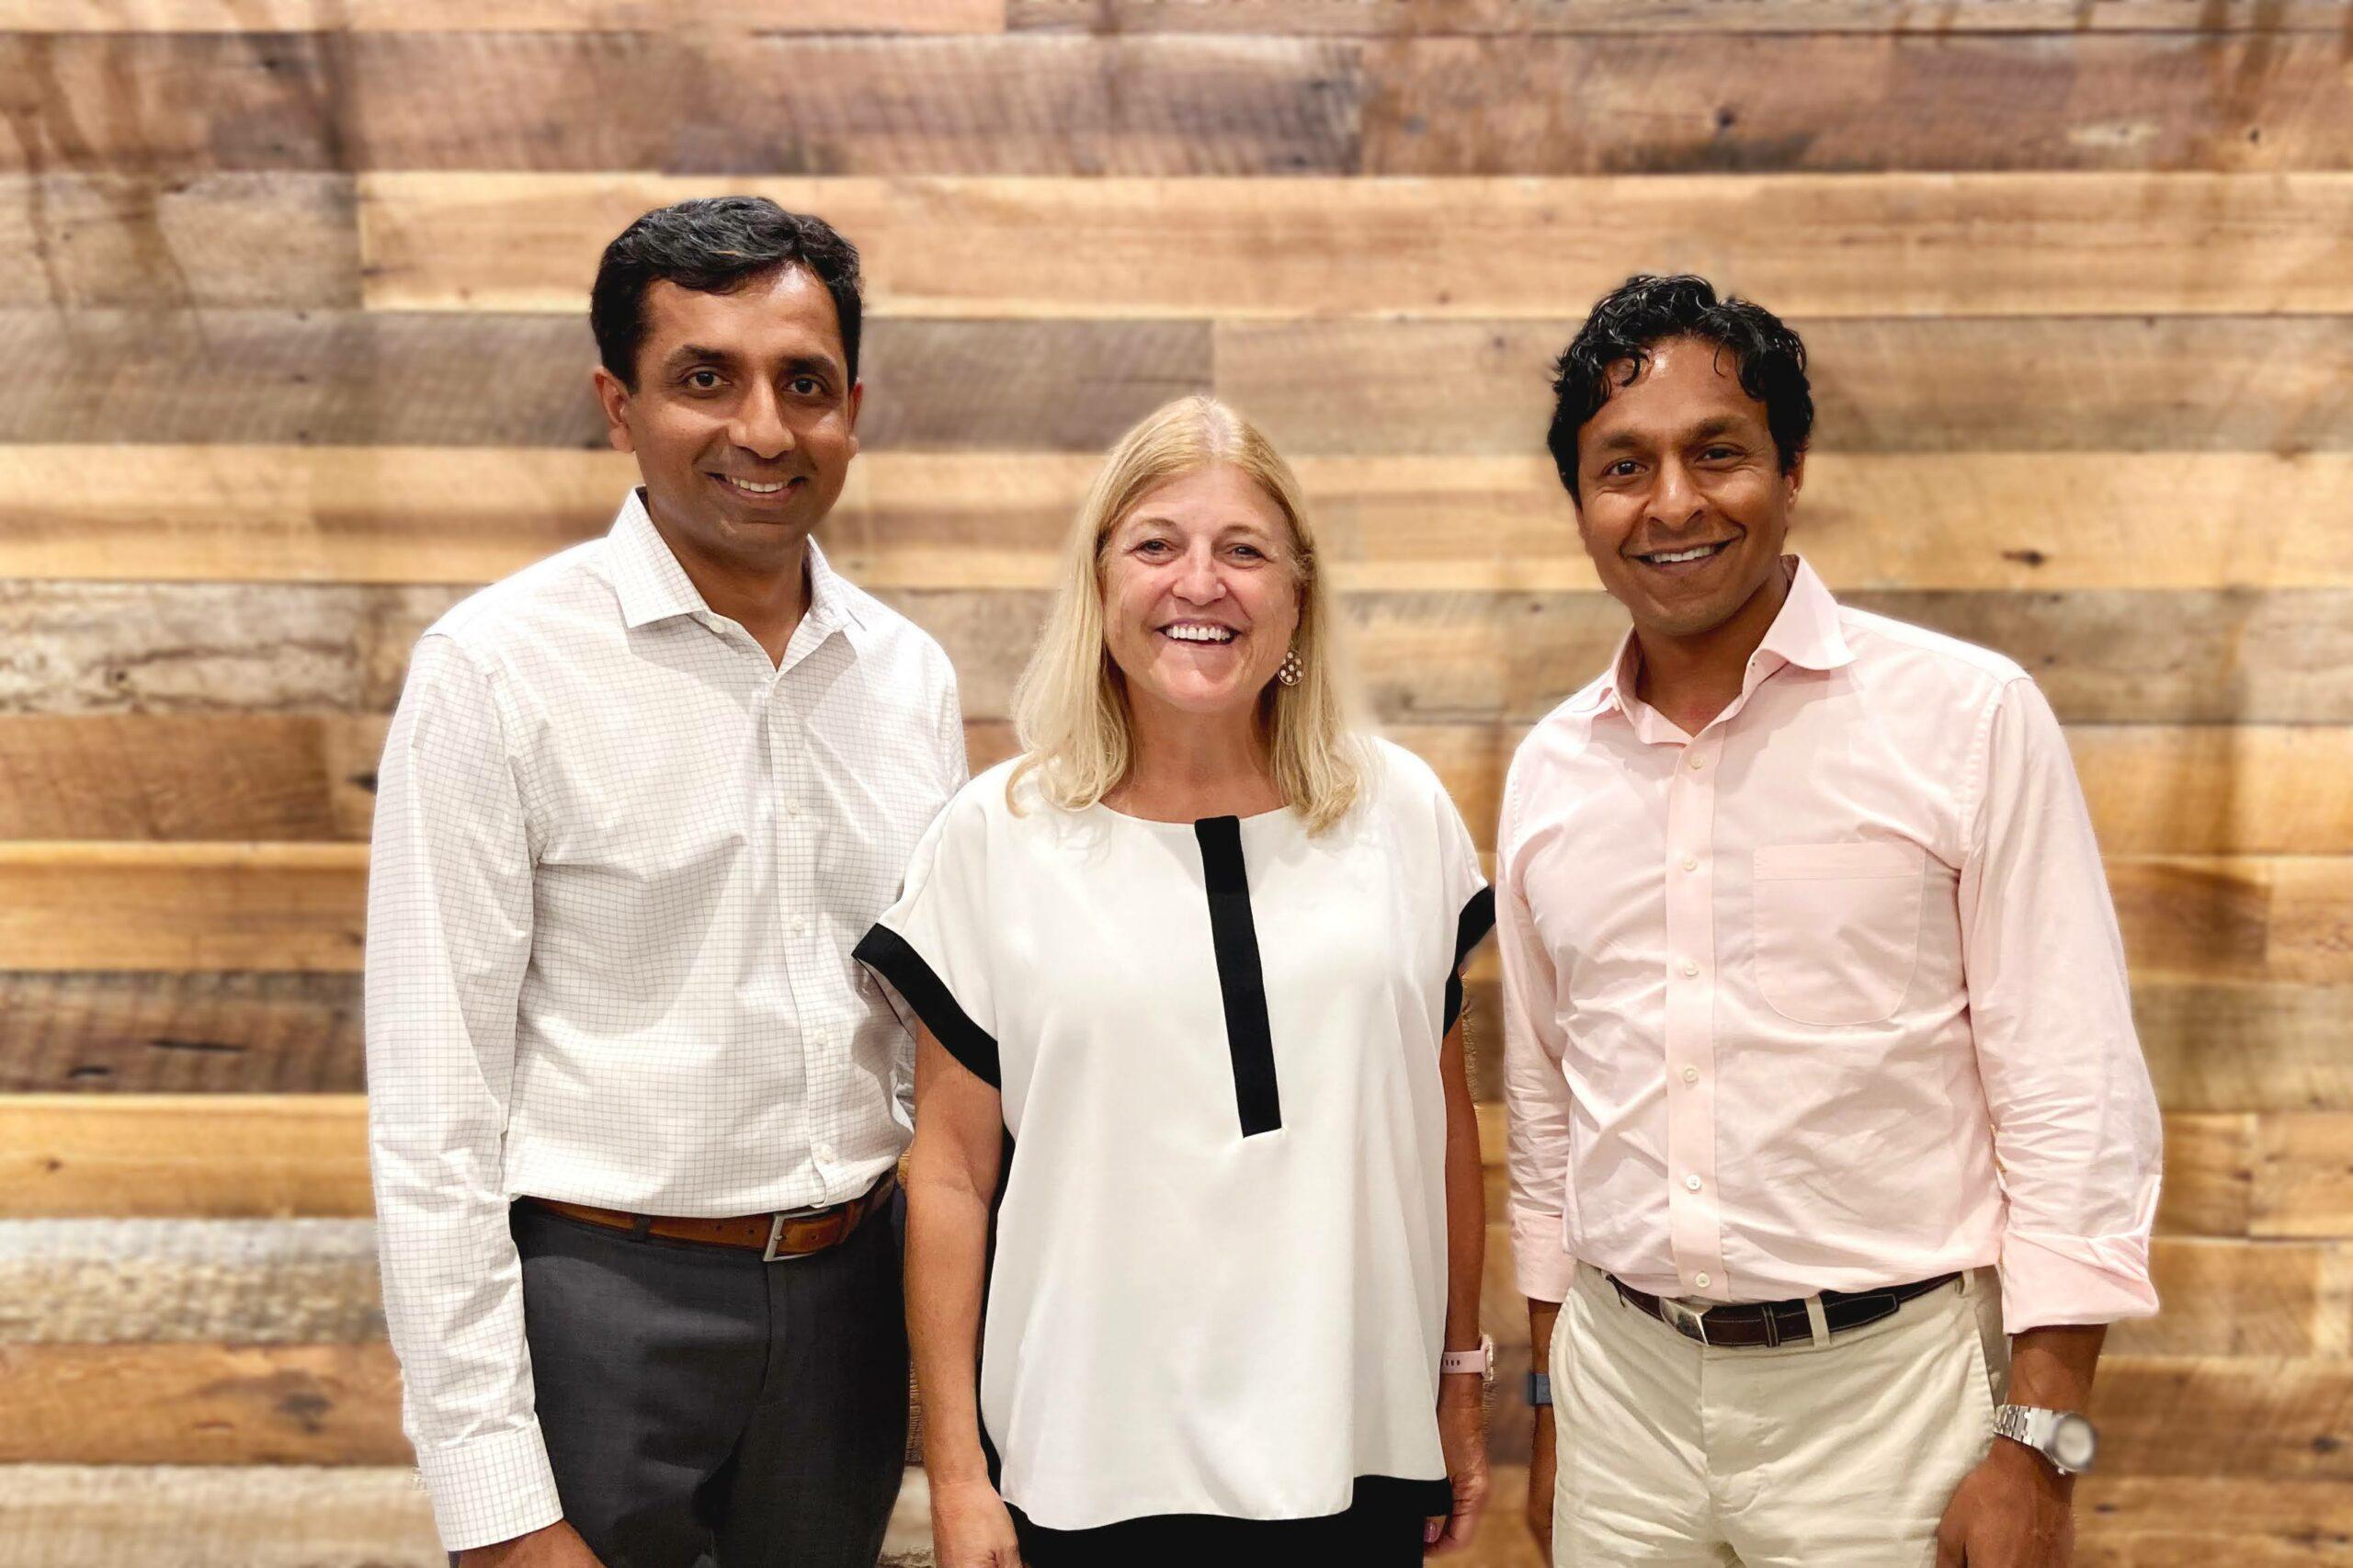 Relatient Merges with Radix Health Patient Access Platform and Raises Over $ 100 Million